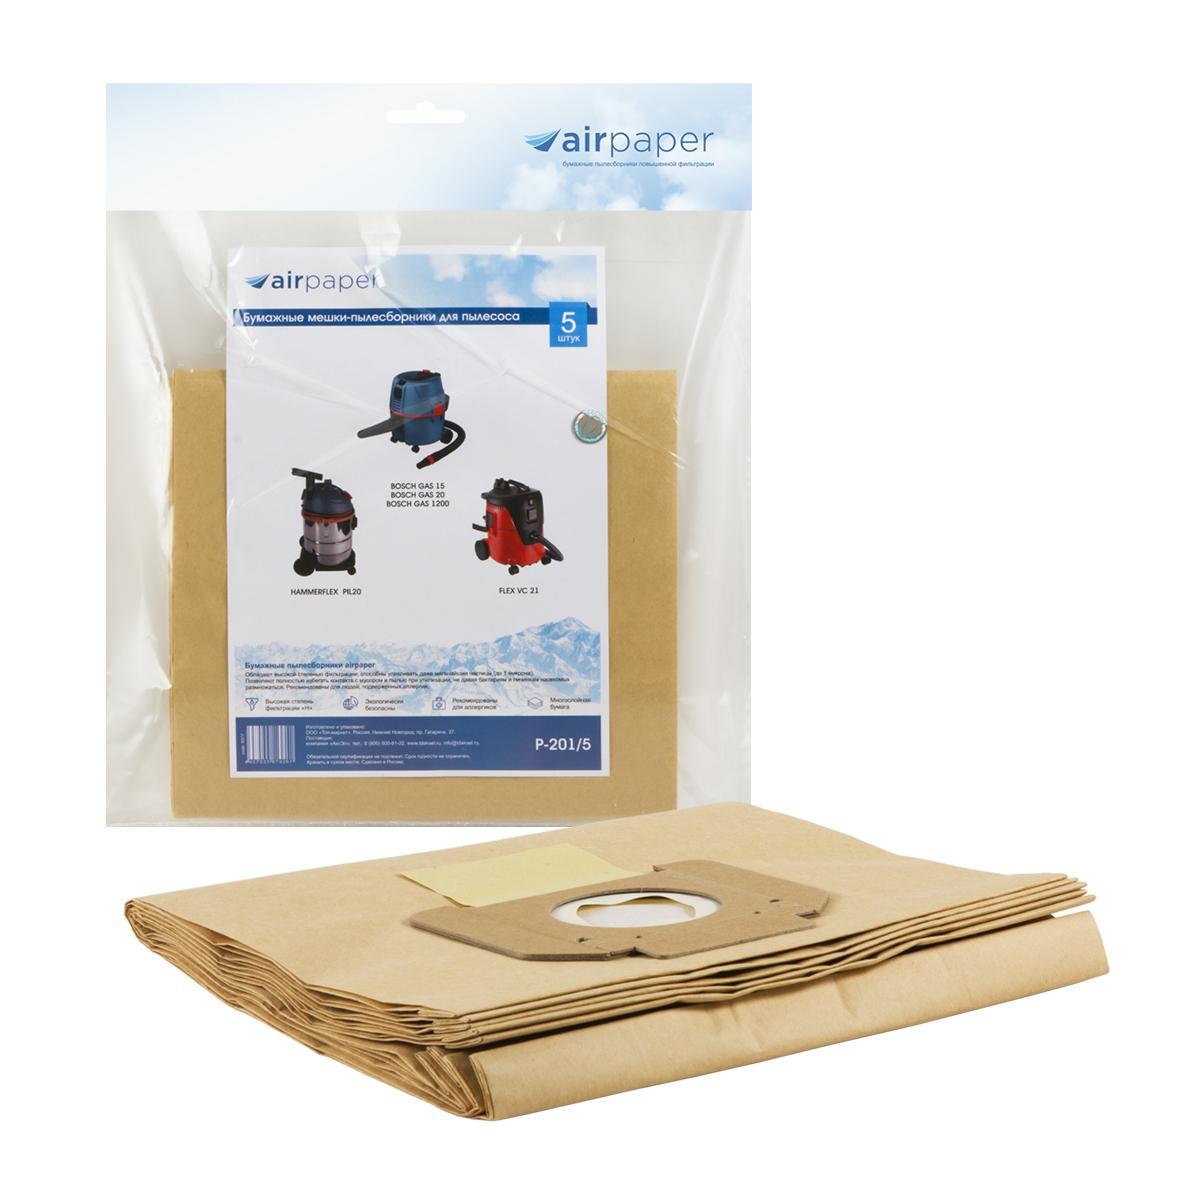 Мешок Air paper P-201/5 5 шт./уп. мешок air paper p 3031